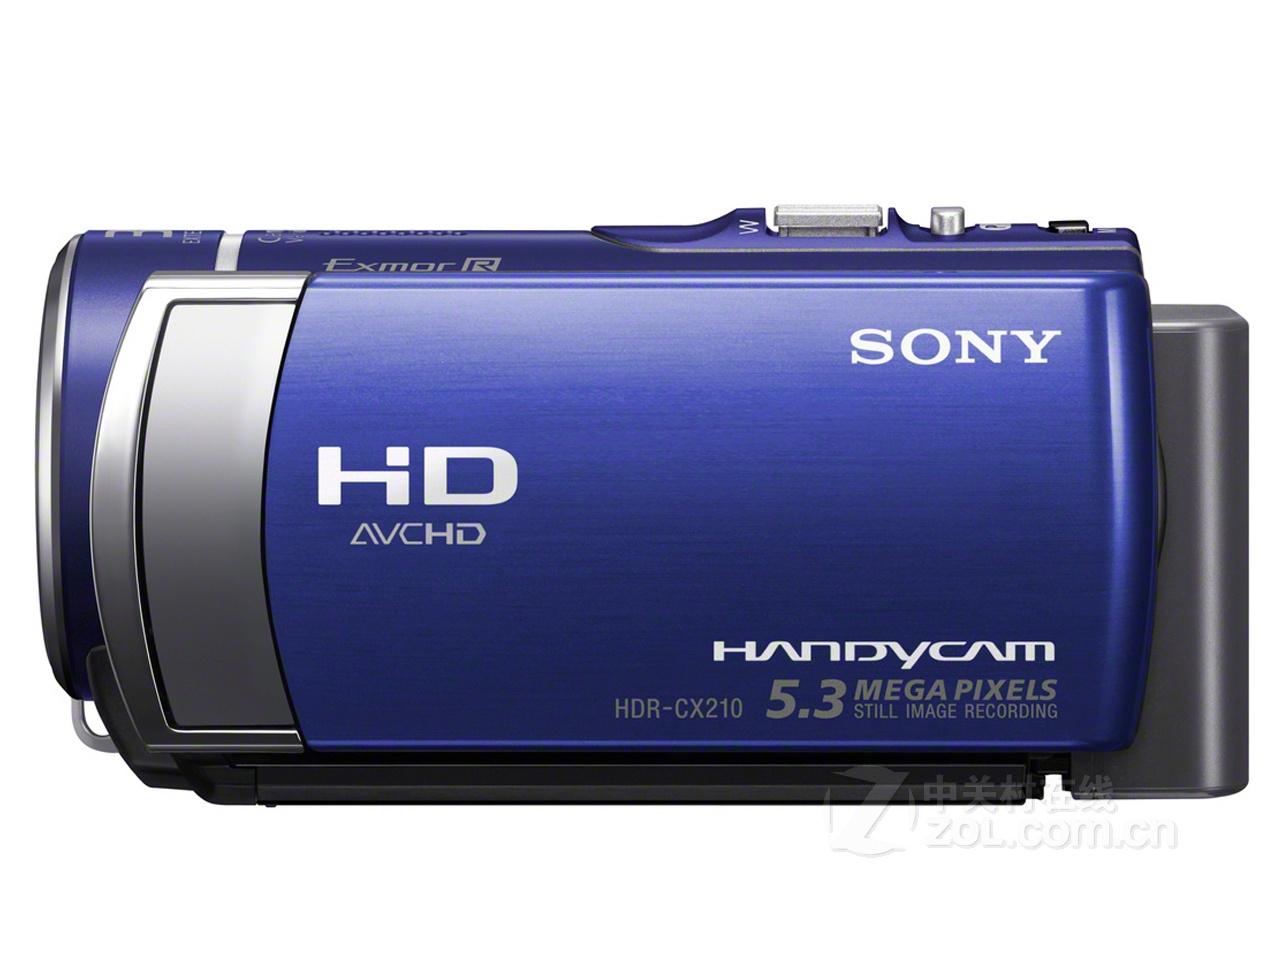 电视4k和hdr区别_索尼a1 4khdr_iphone投屏到索尼电视